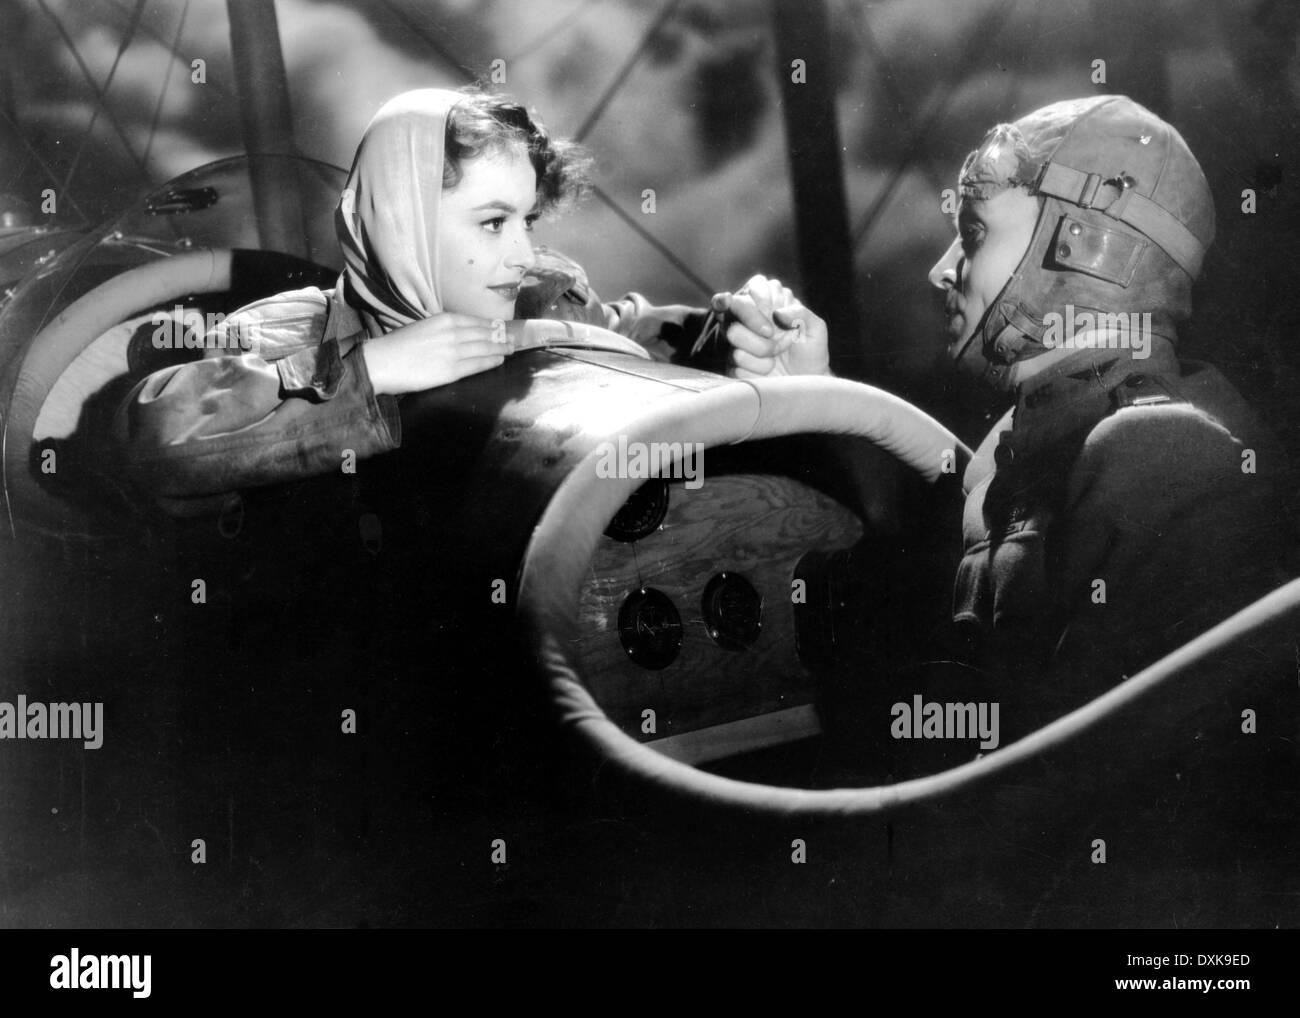 TO EACH HIS OWN (US1946) OLIVIA DE HAVILLAND, JOHN LUND - Stock Image